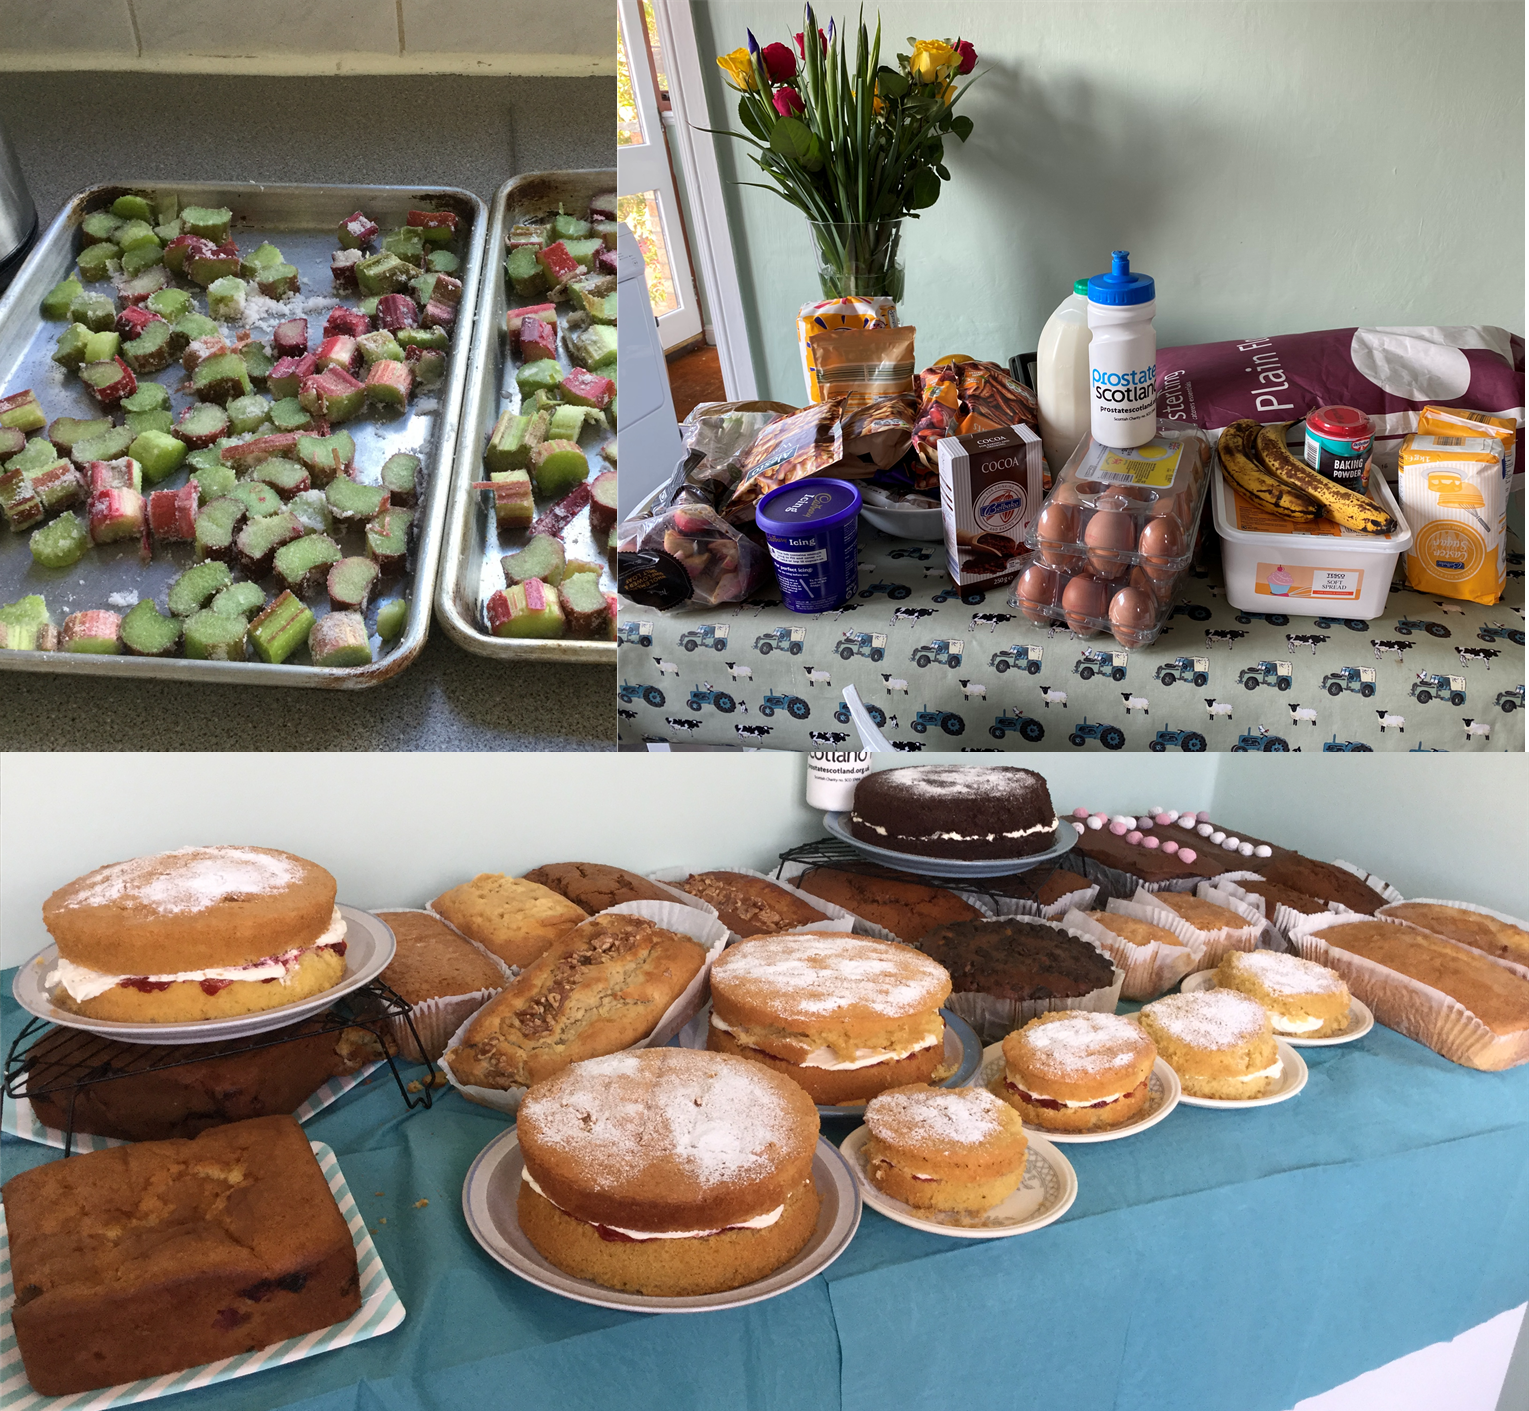 Linda's cakes Prostate Scotland